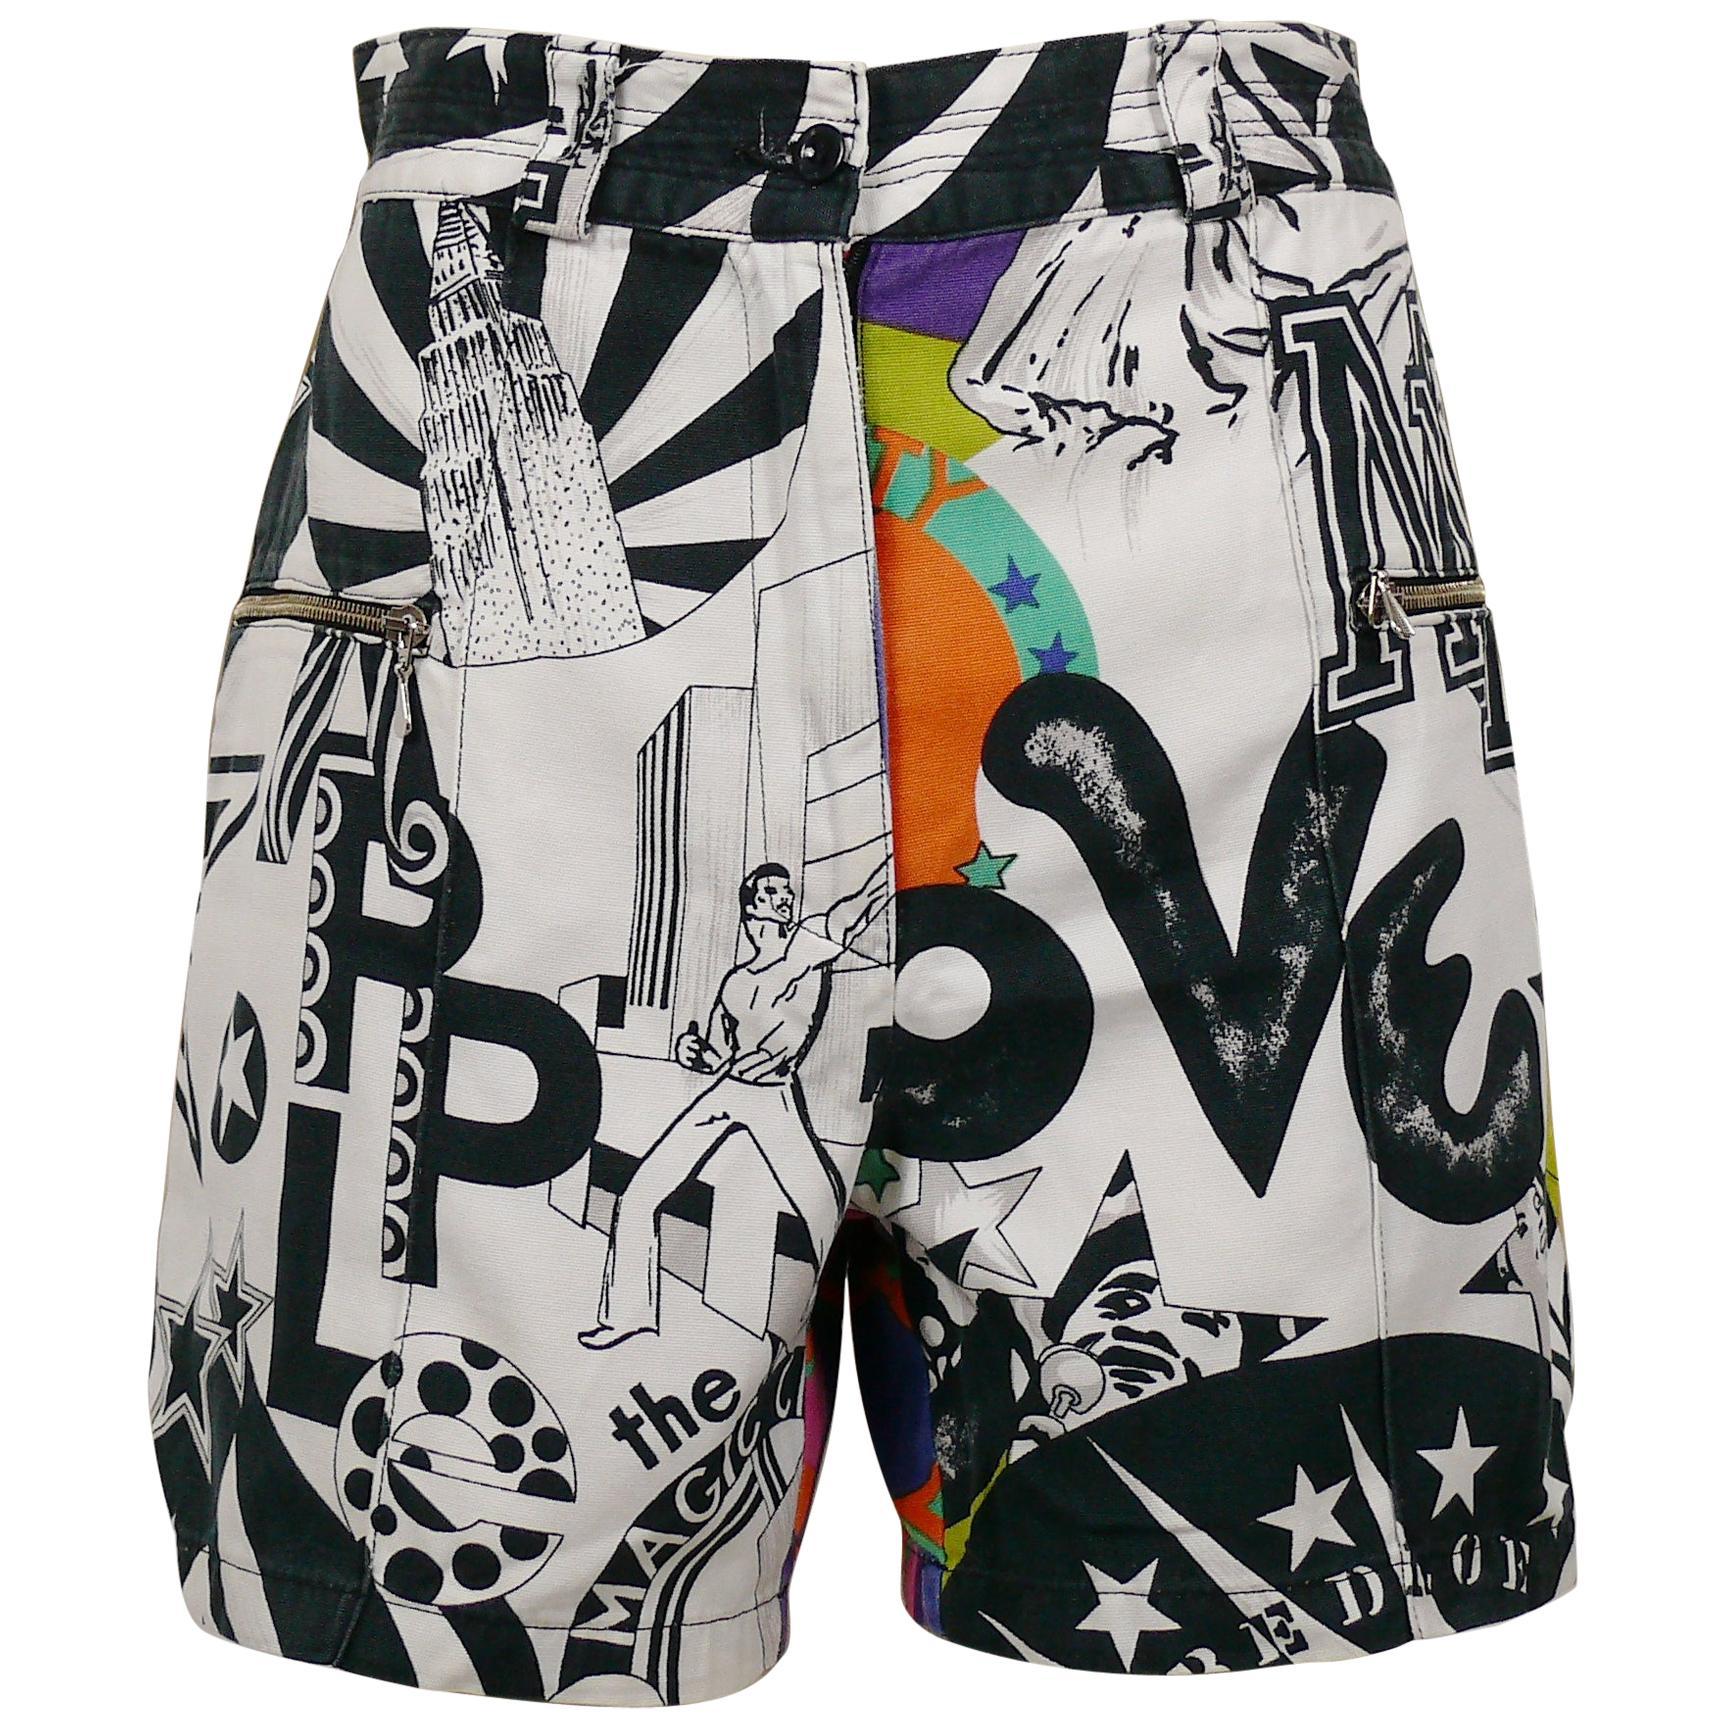 Versace Jeans Couture Vintage Manhattan New York City Graffiti Prints Shorts